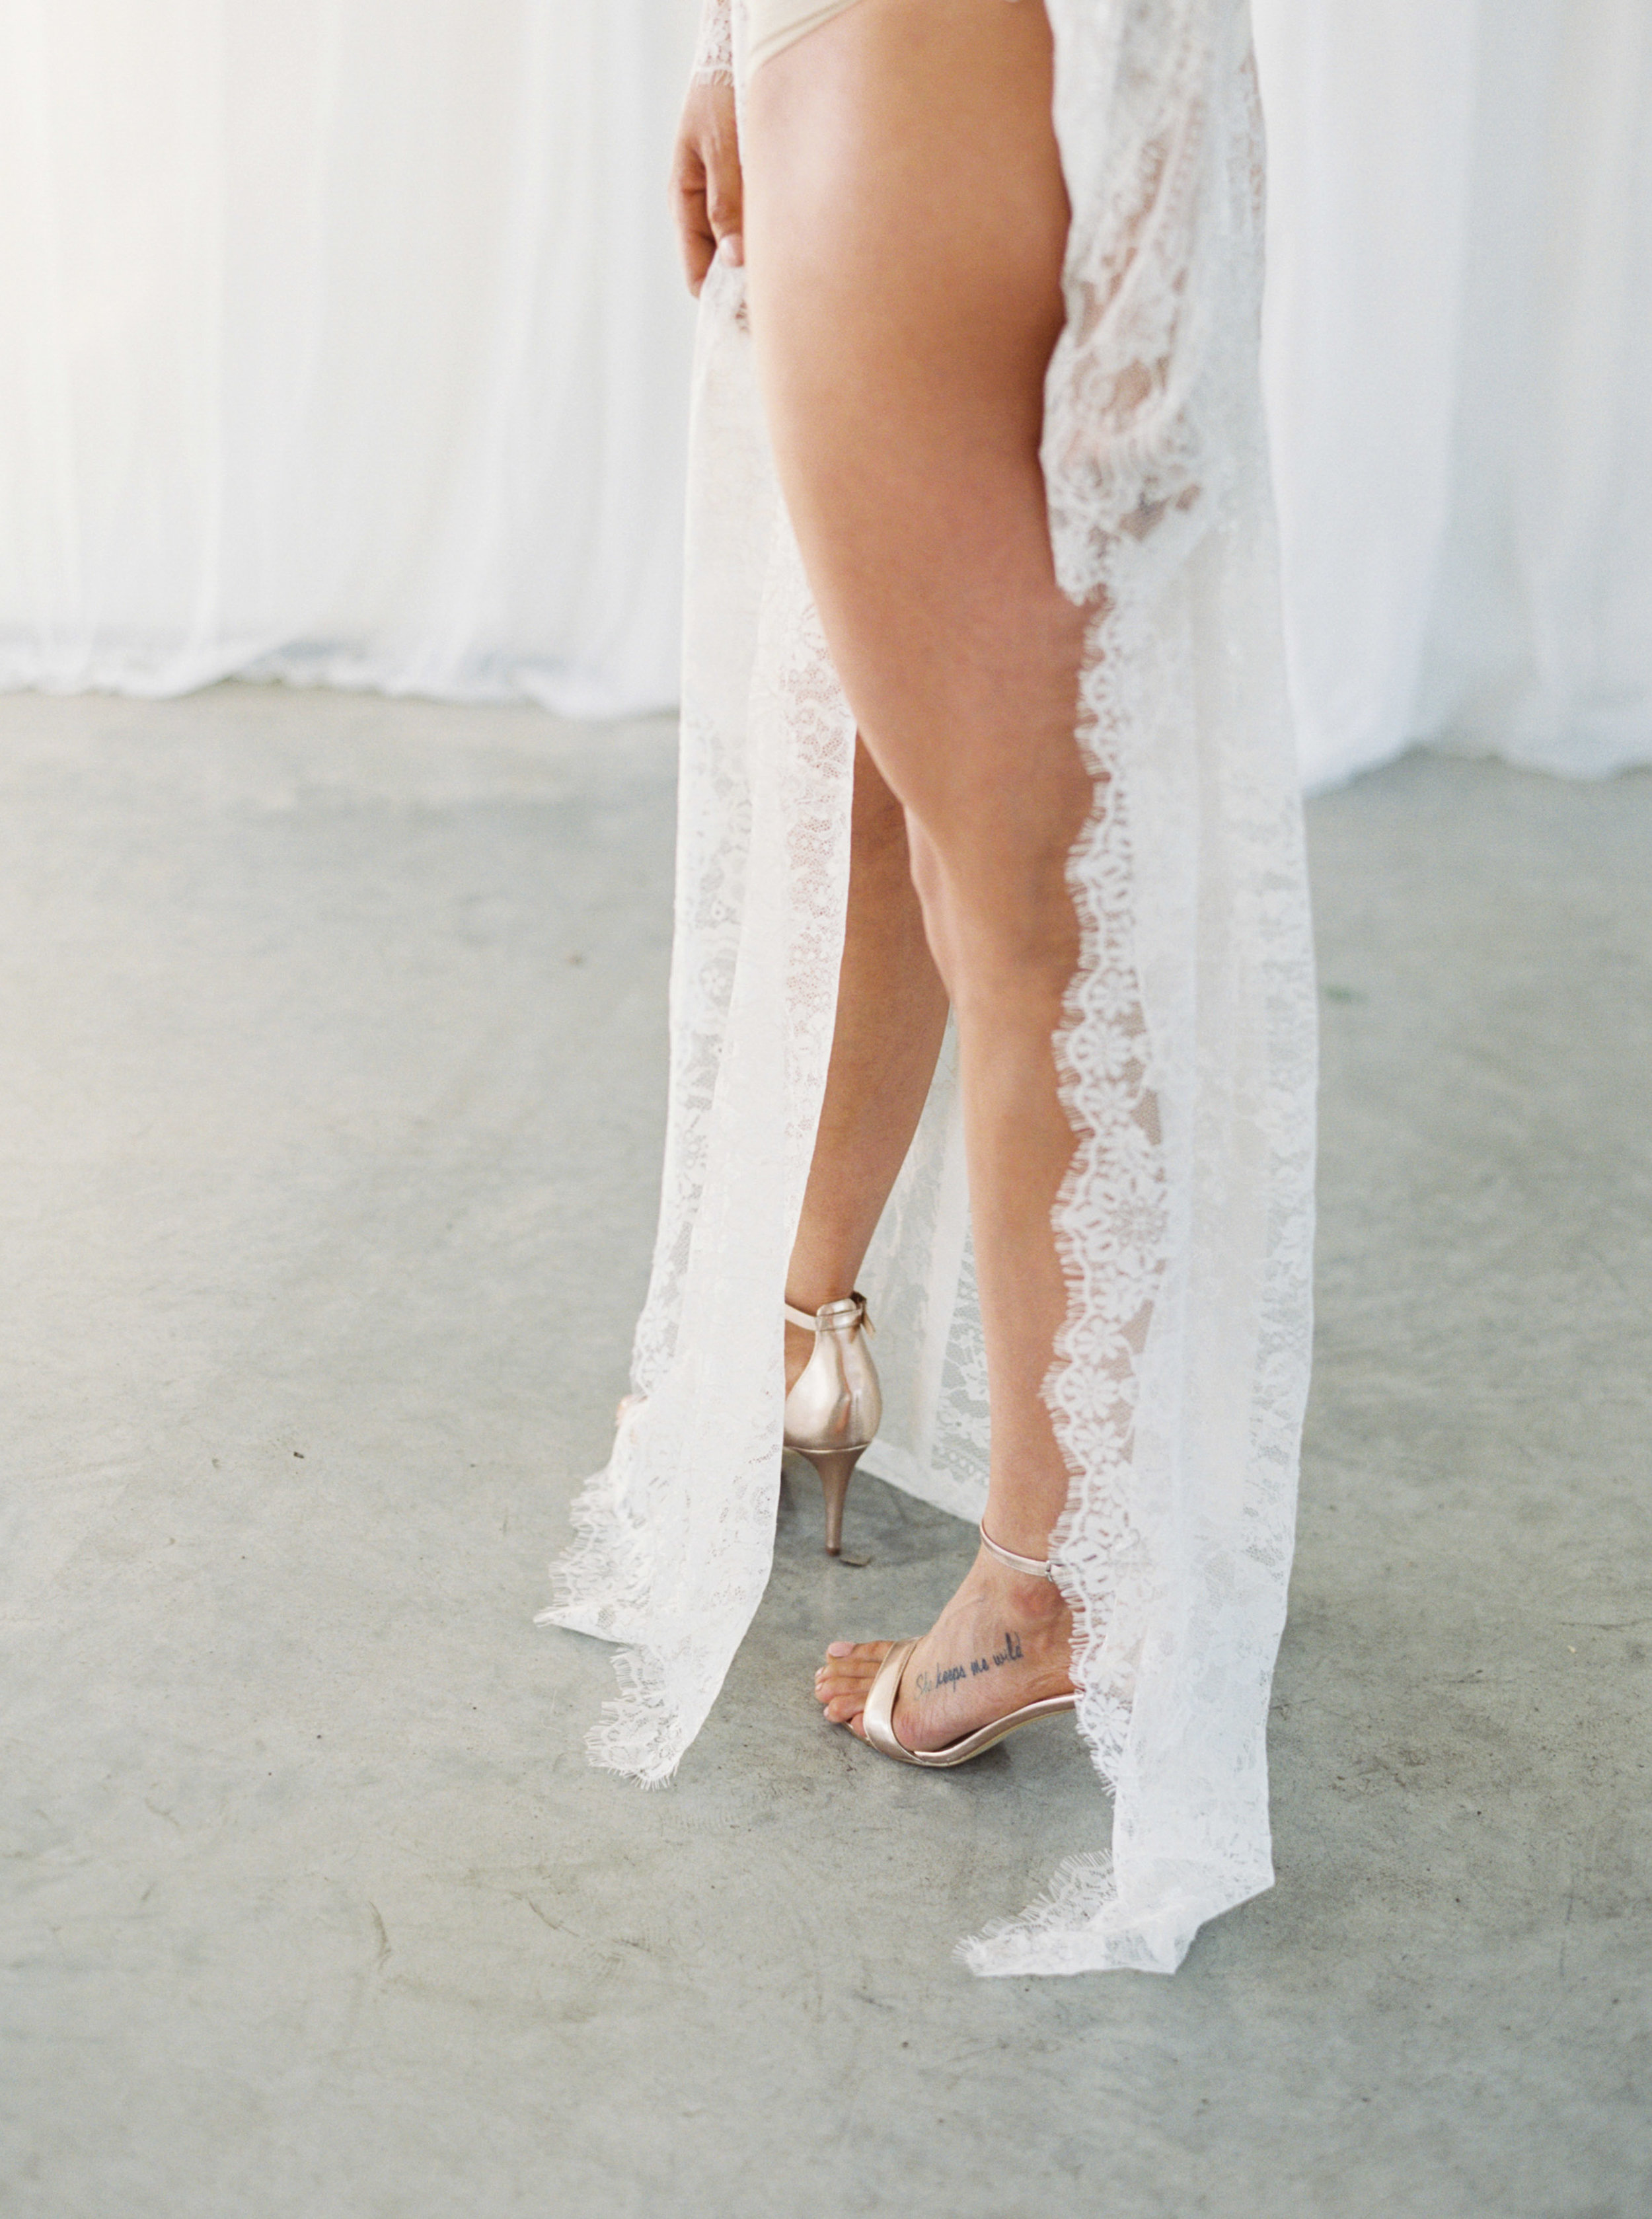 00002- Mudgee Wedding Photographer Sheri McMahon.jpg